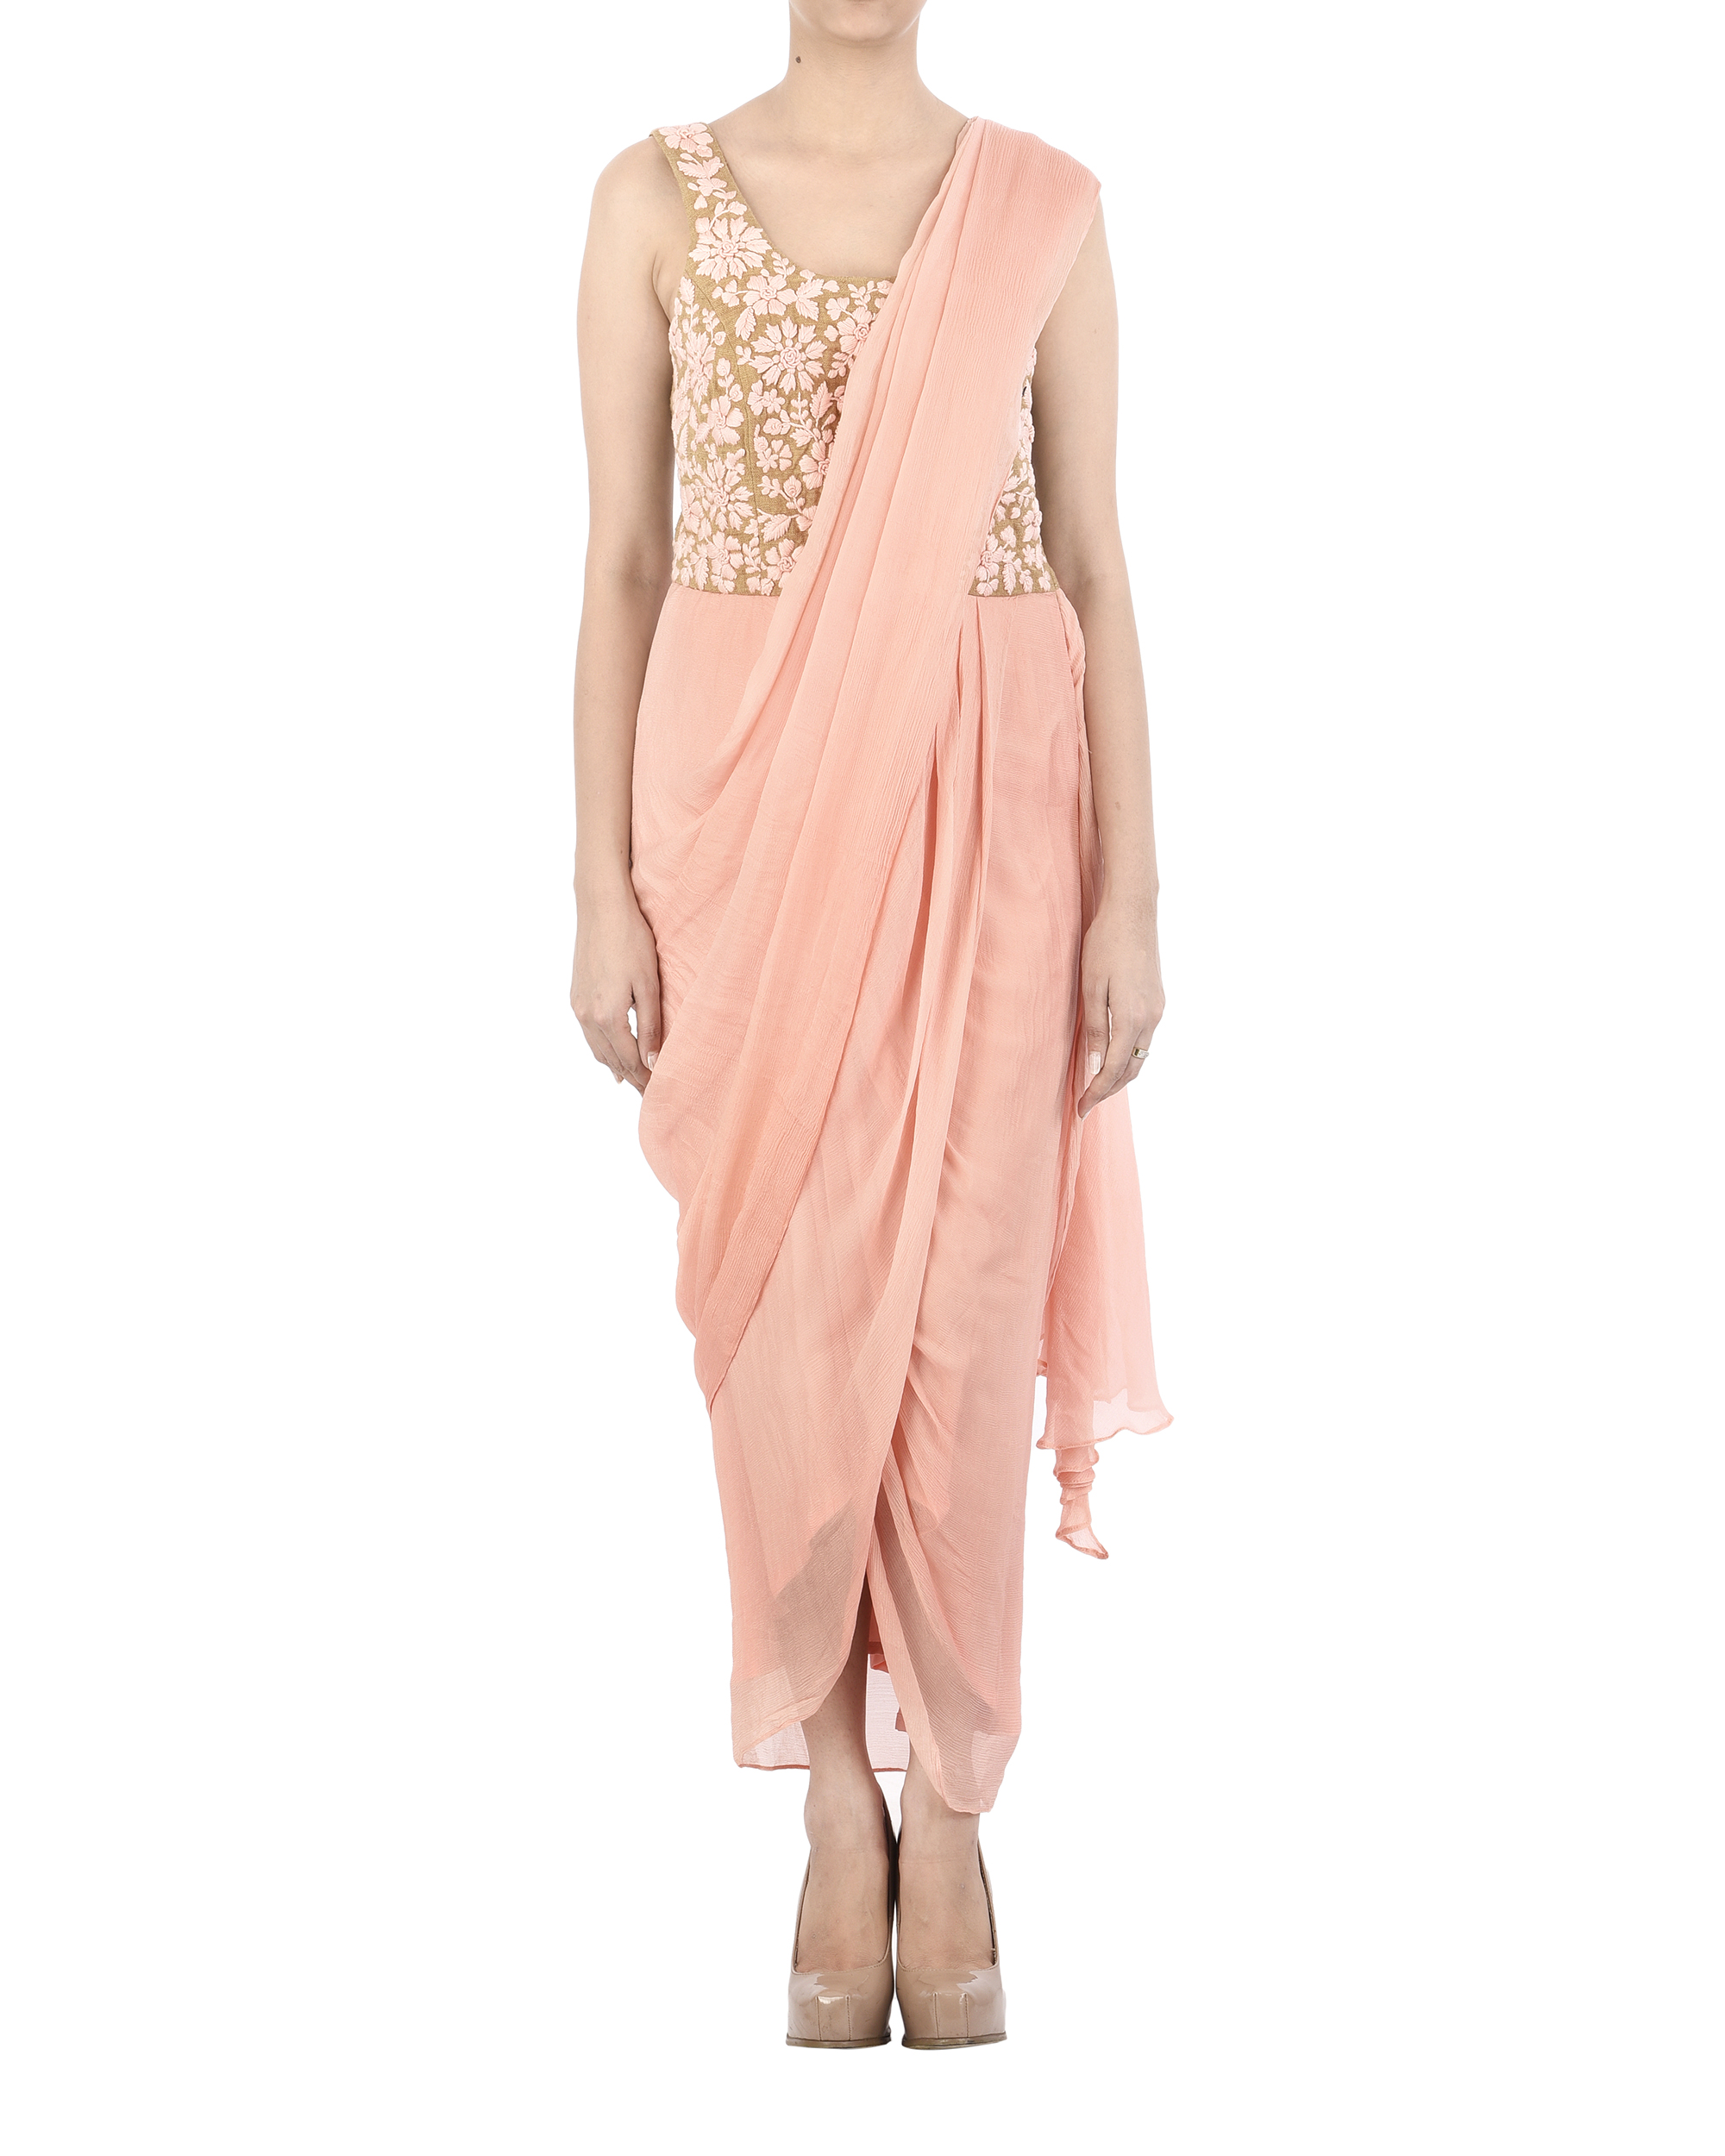 Fashion dresses online shopping india 24